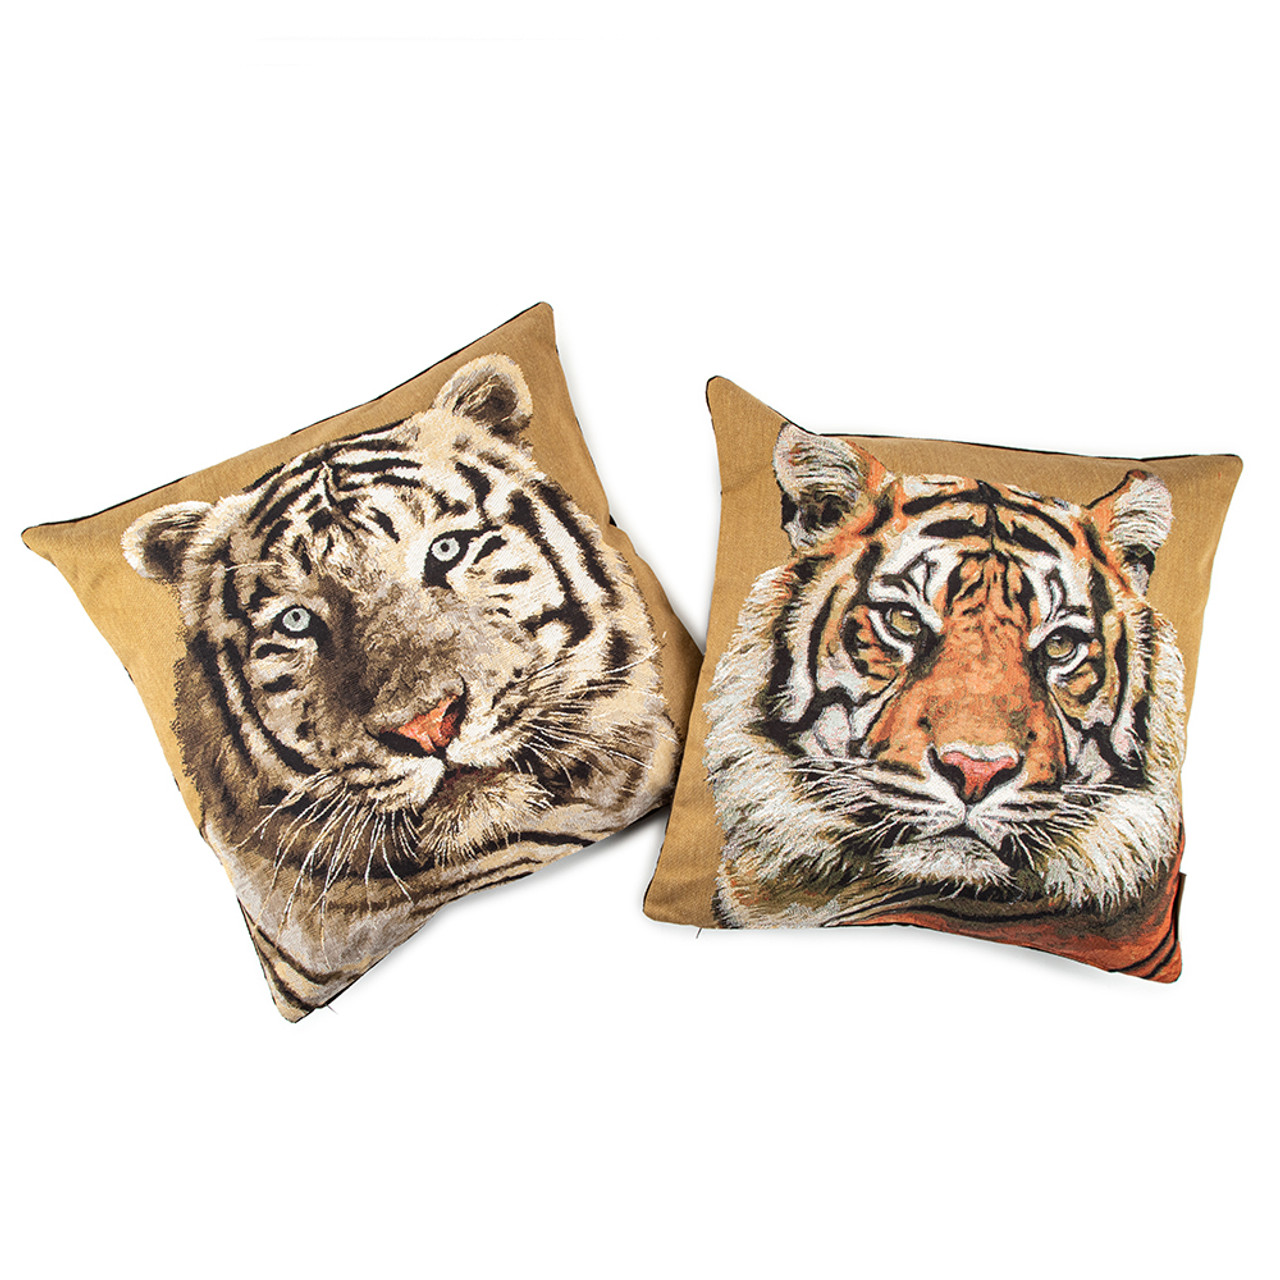 Tiger Decorative Pillows Between The Sheets